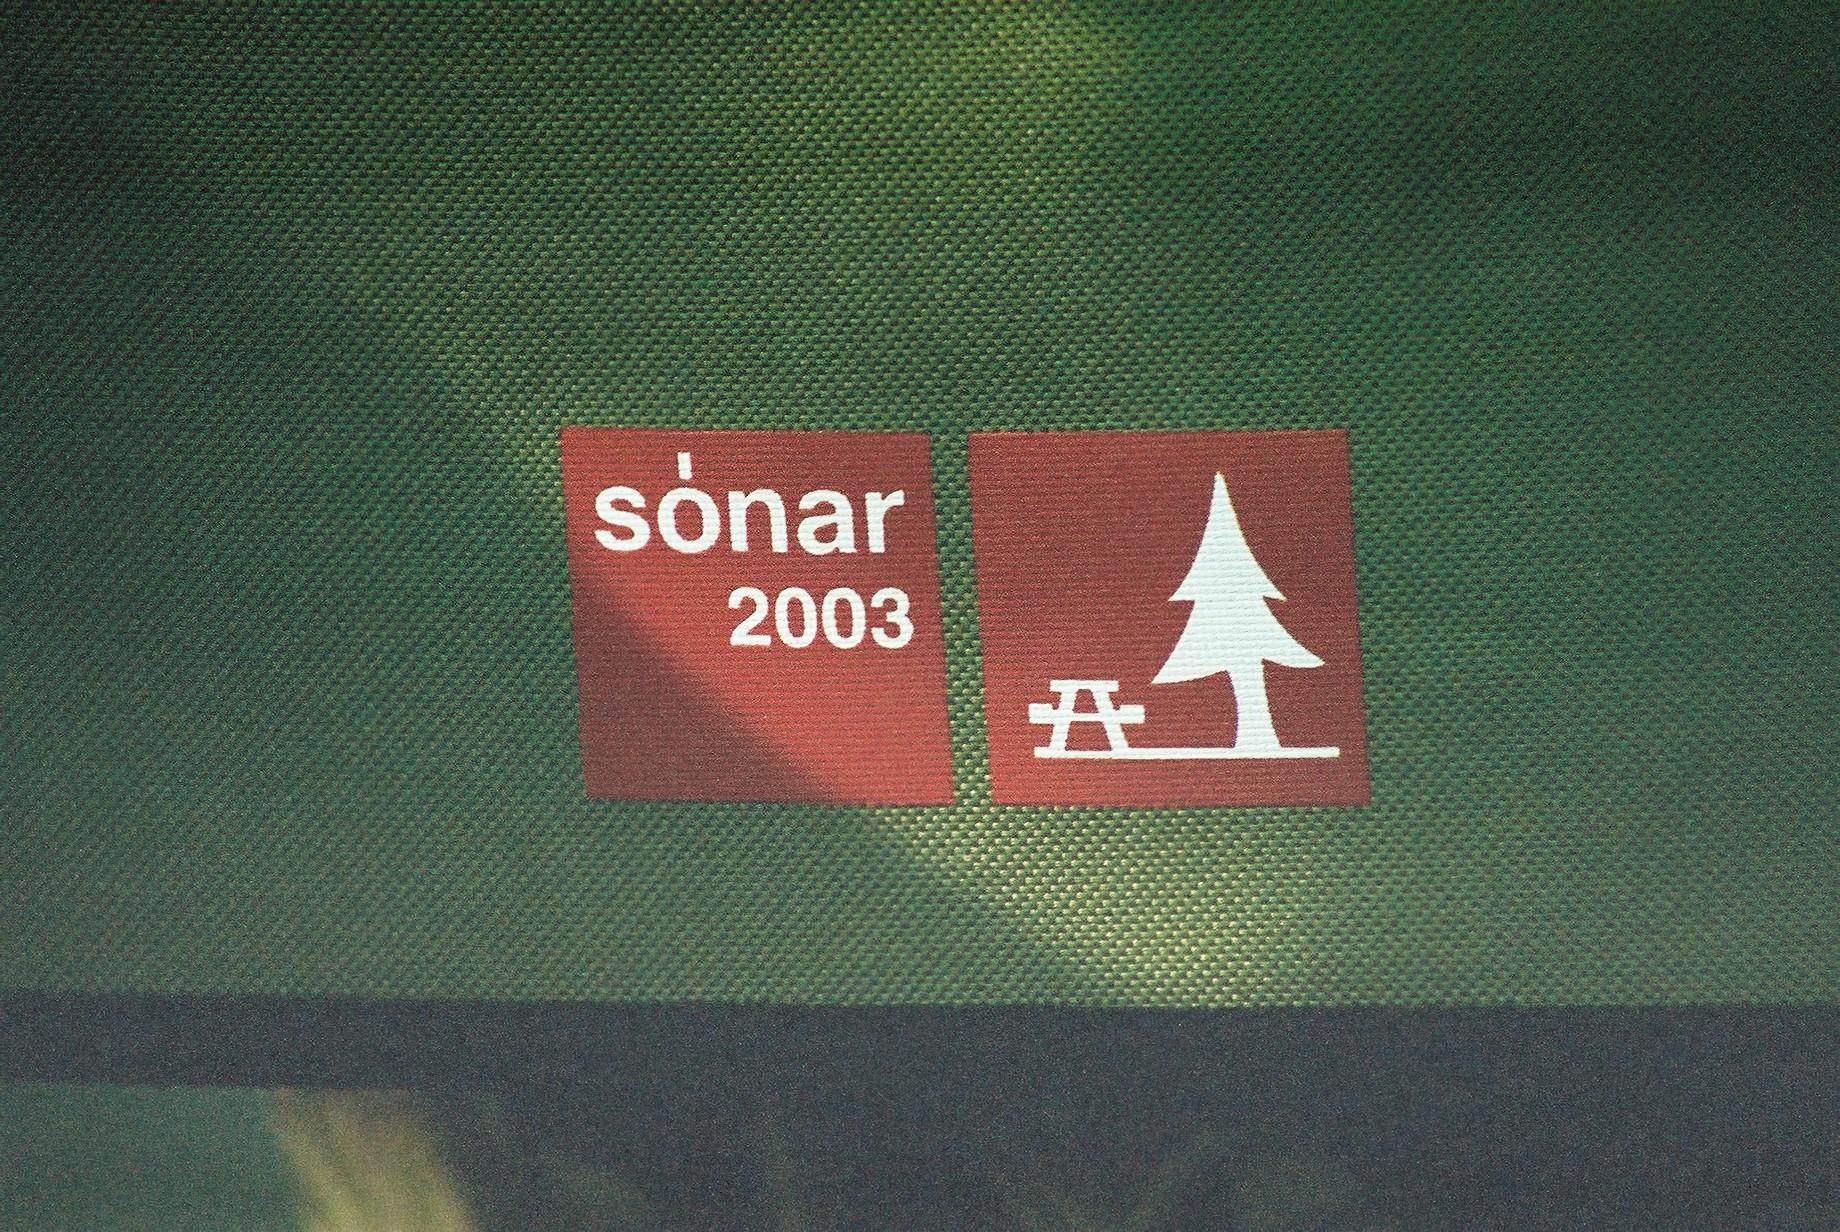 Sonar 2003, Barcelona.JPG